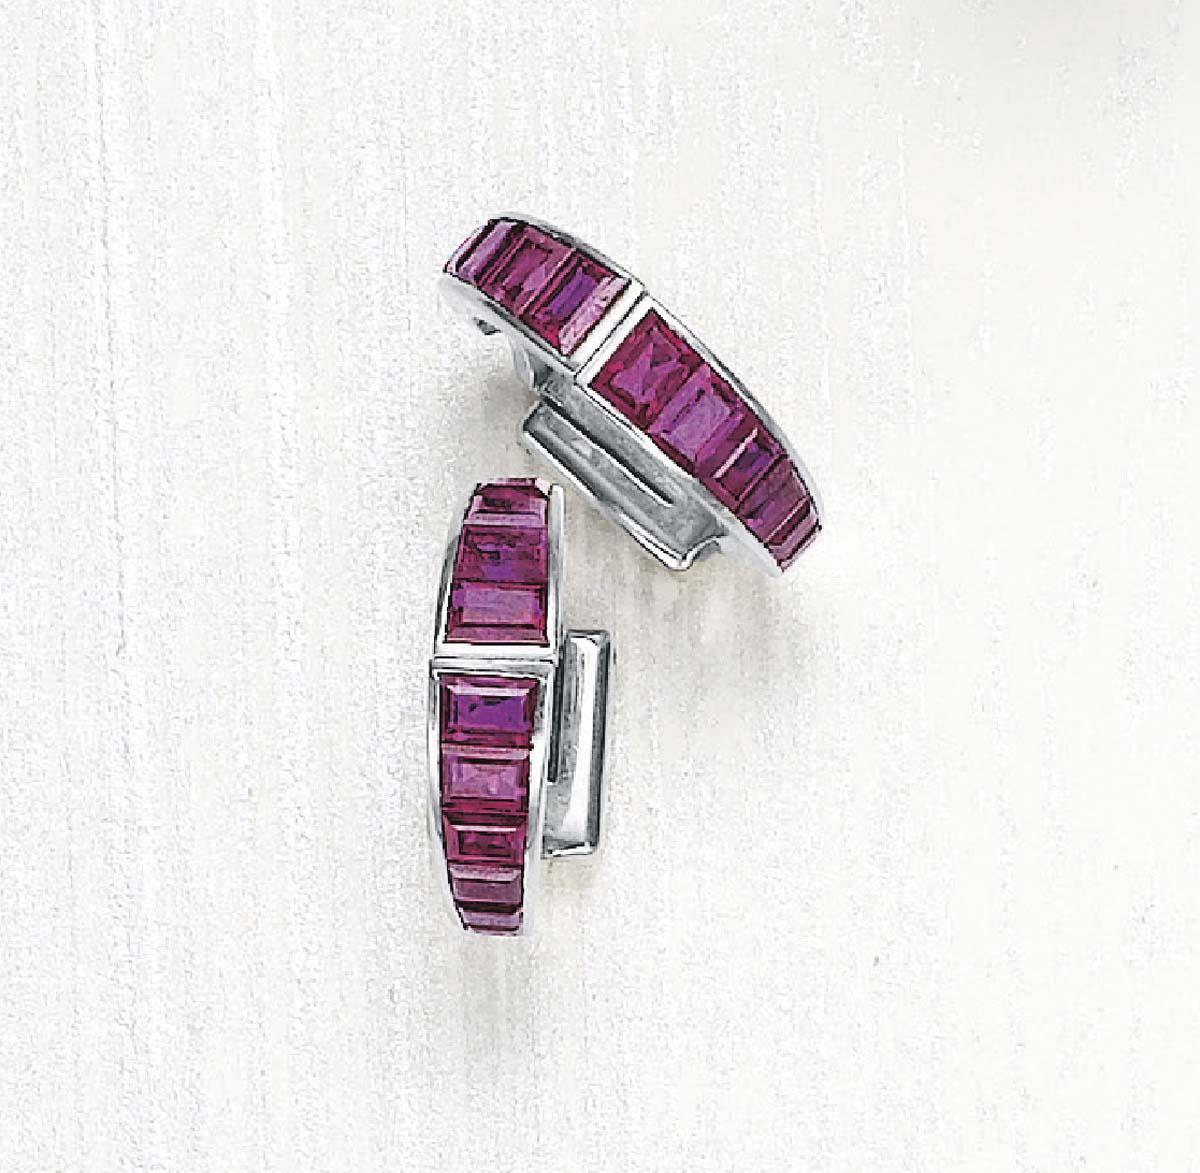 A Rare Pair of Ruby Art Deco Cufflinks